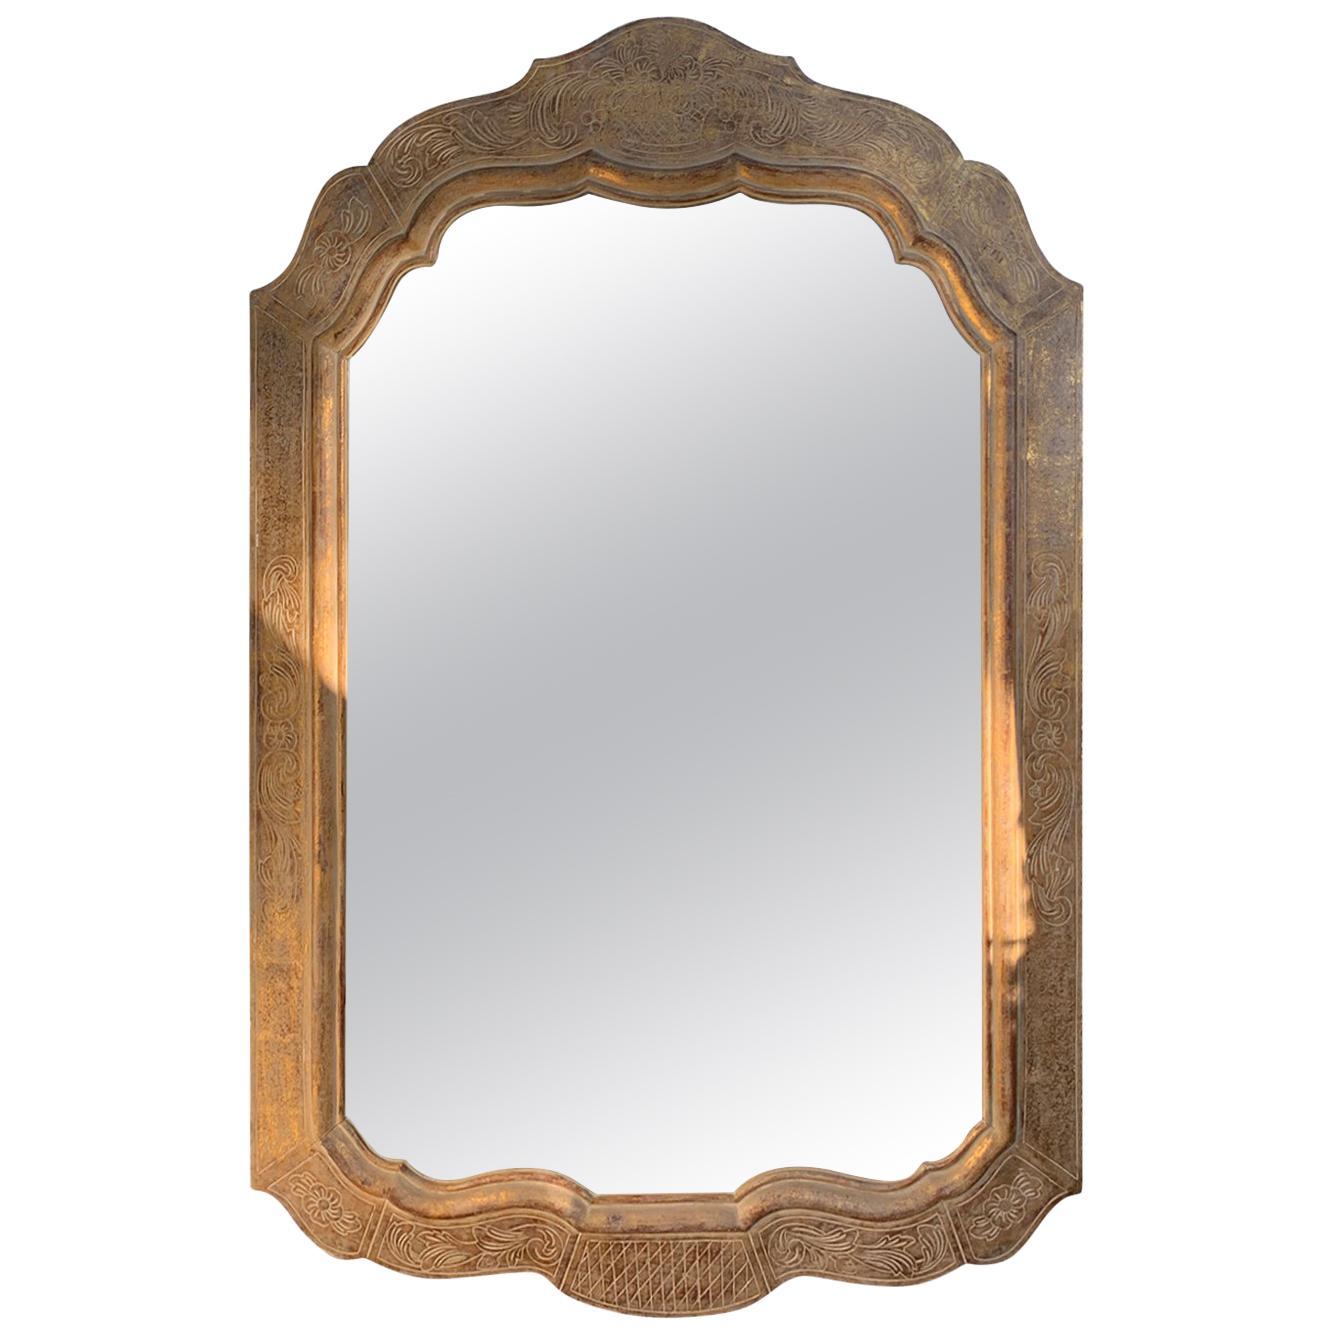 Style of Max Kuehne circa 1930s Giltwood Wall Mirror